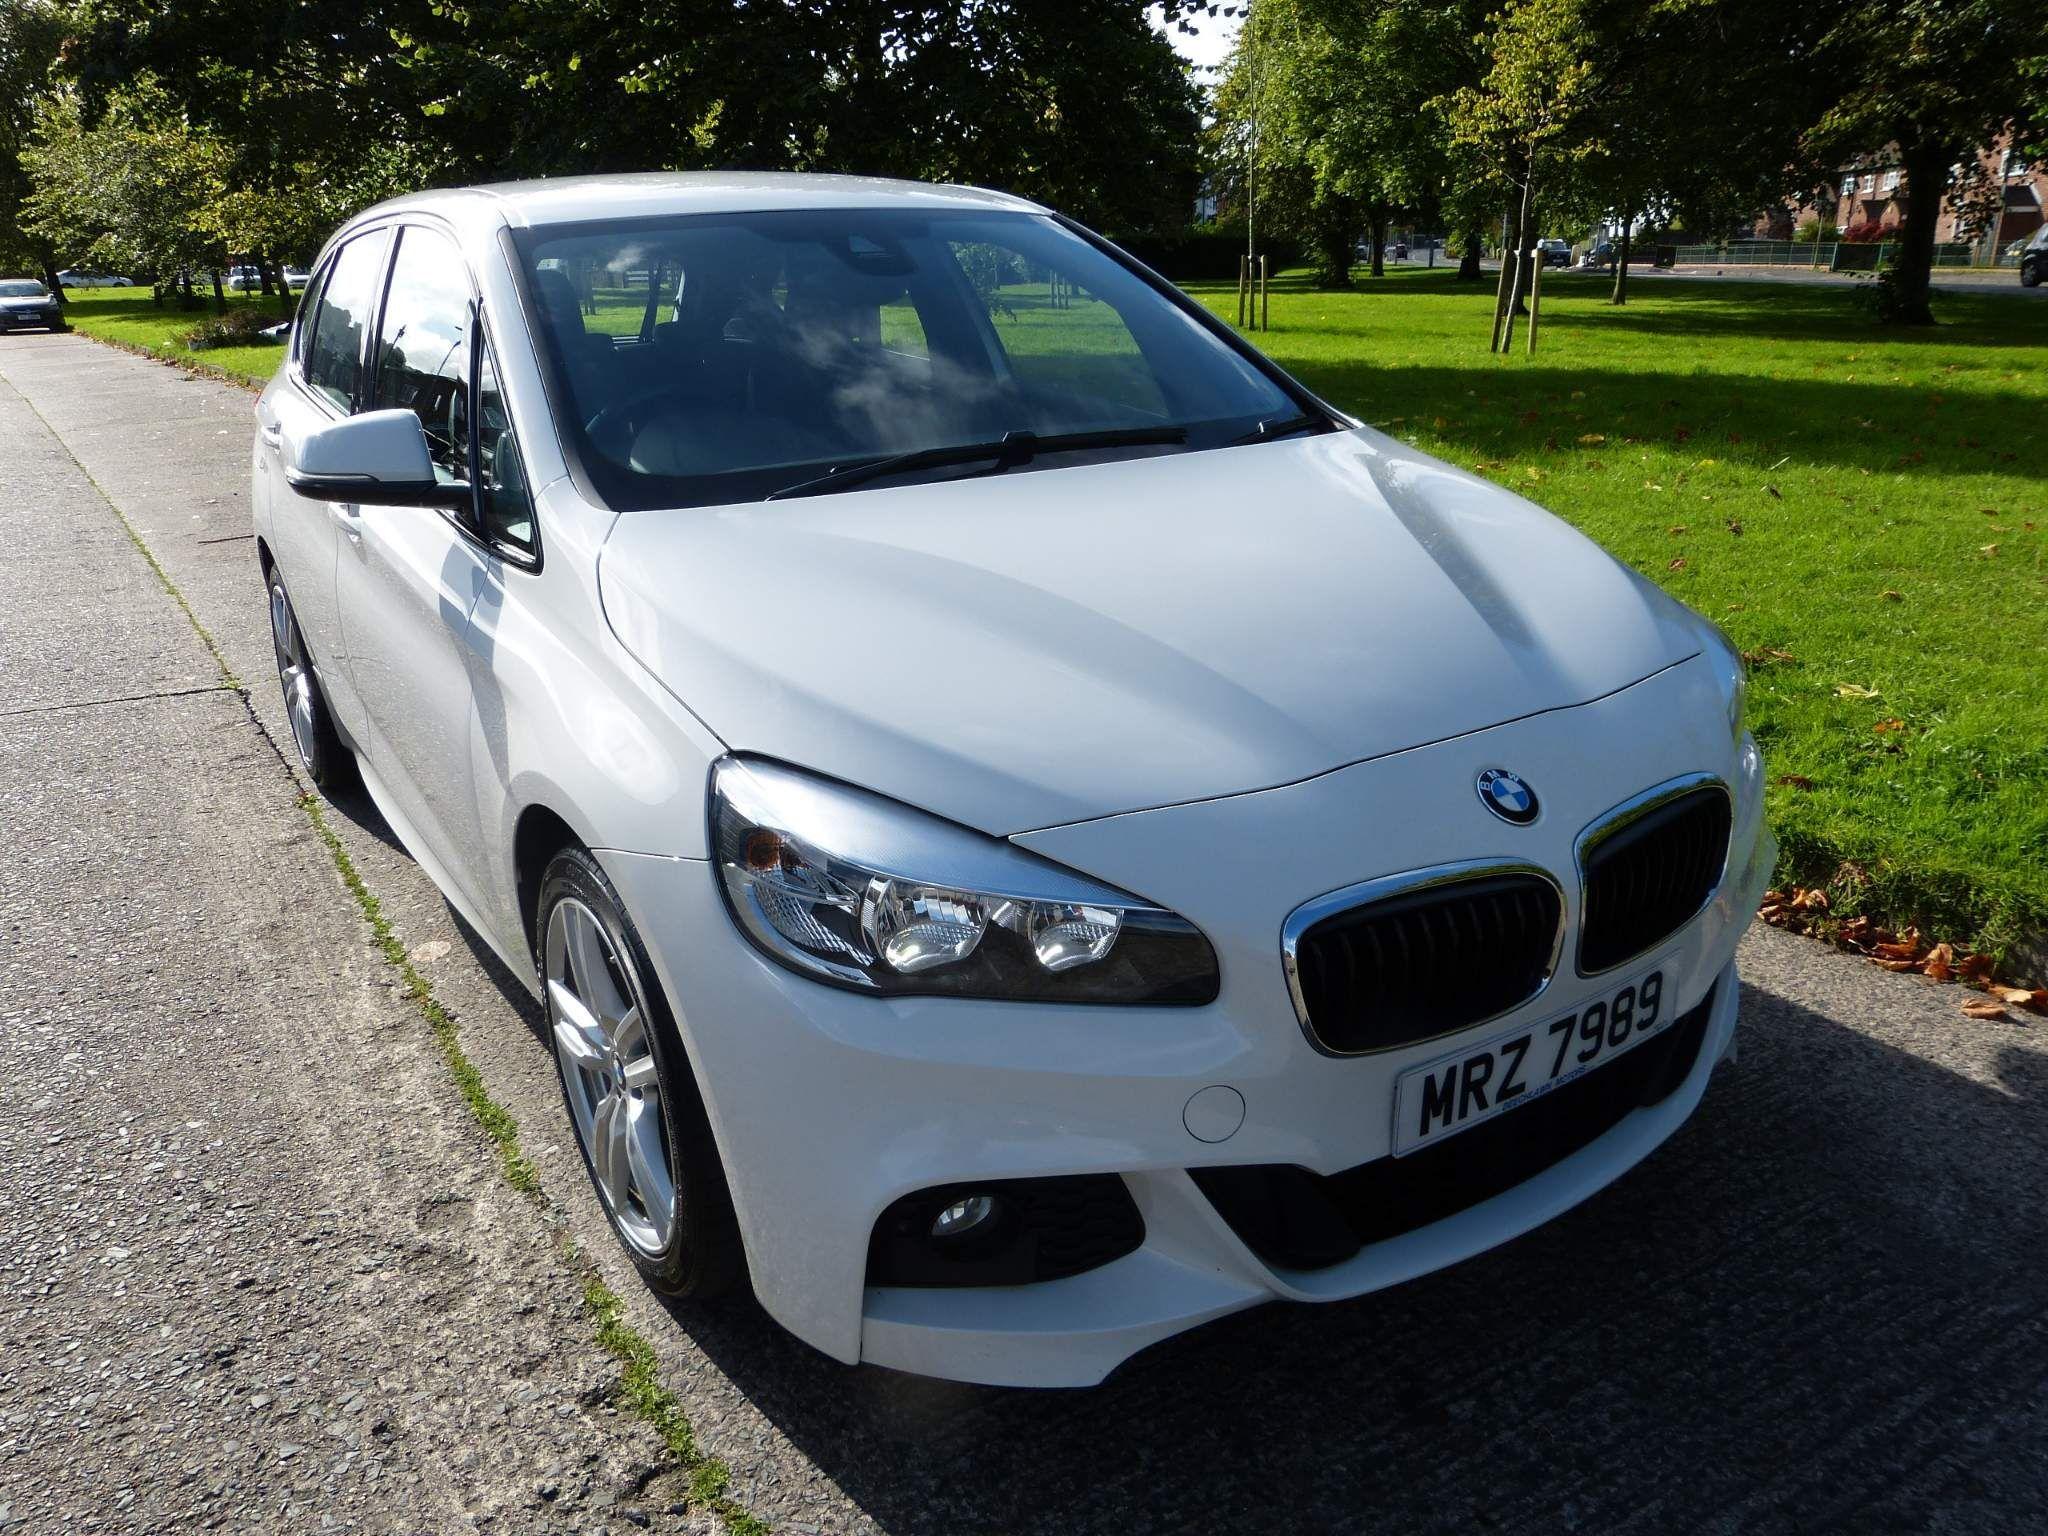 2016 BMW 2 Series Active Tourer 1.5 216d M Sport Active Tourer (s/s) Diesel Manual excellent condition, leather – Beechlawn Motors Belfast